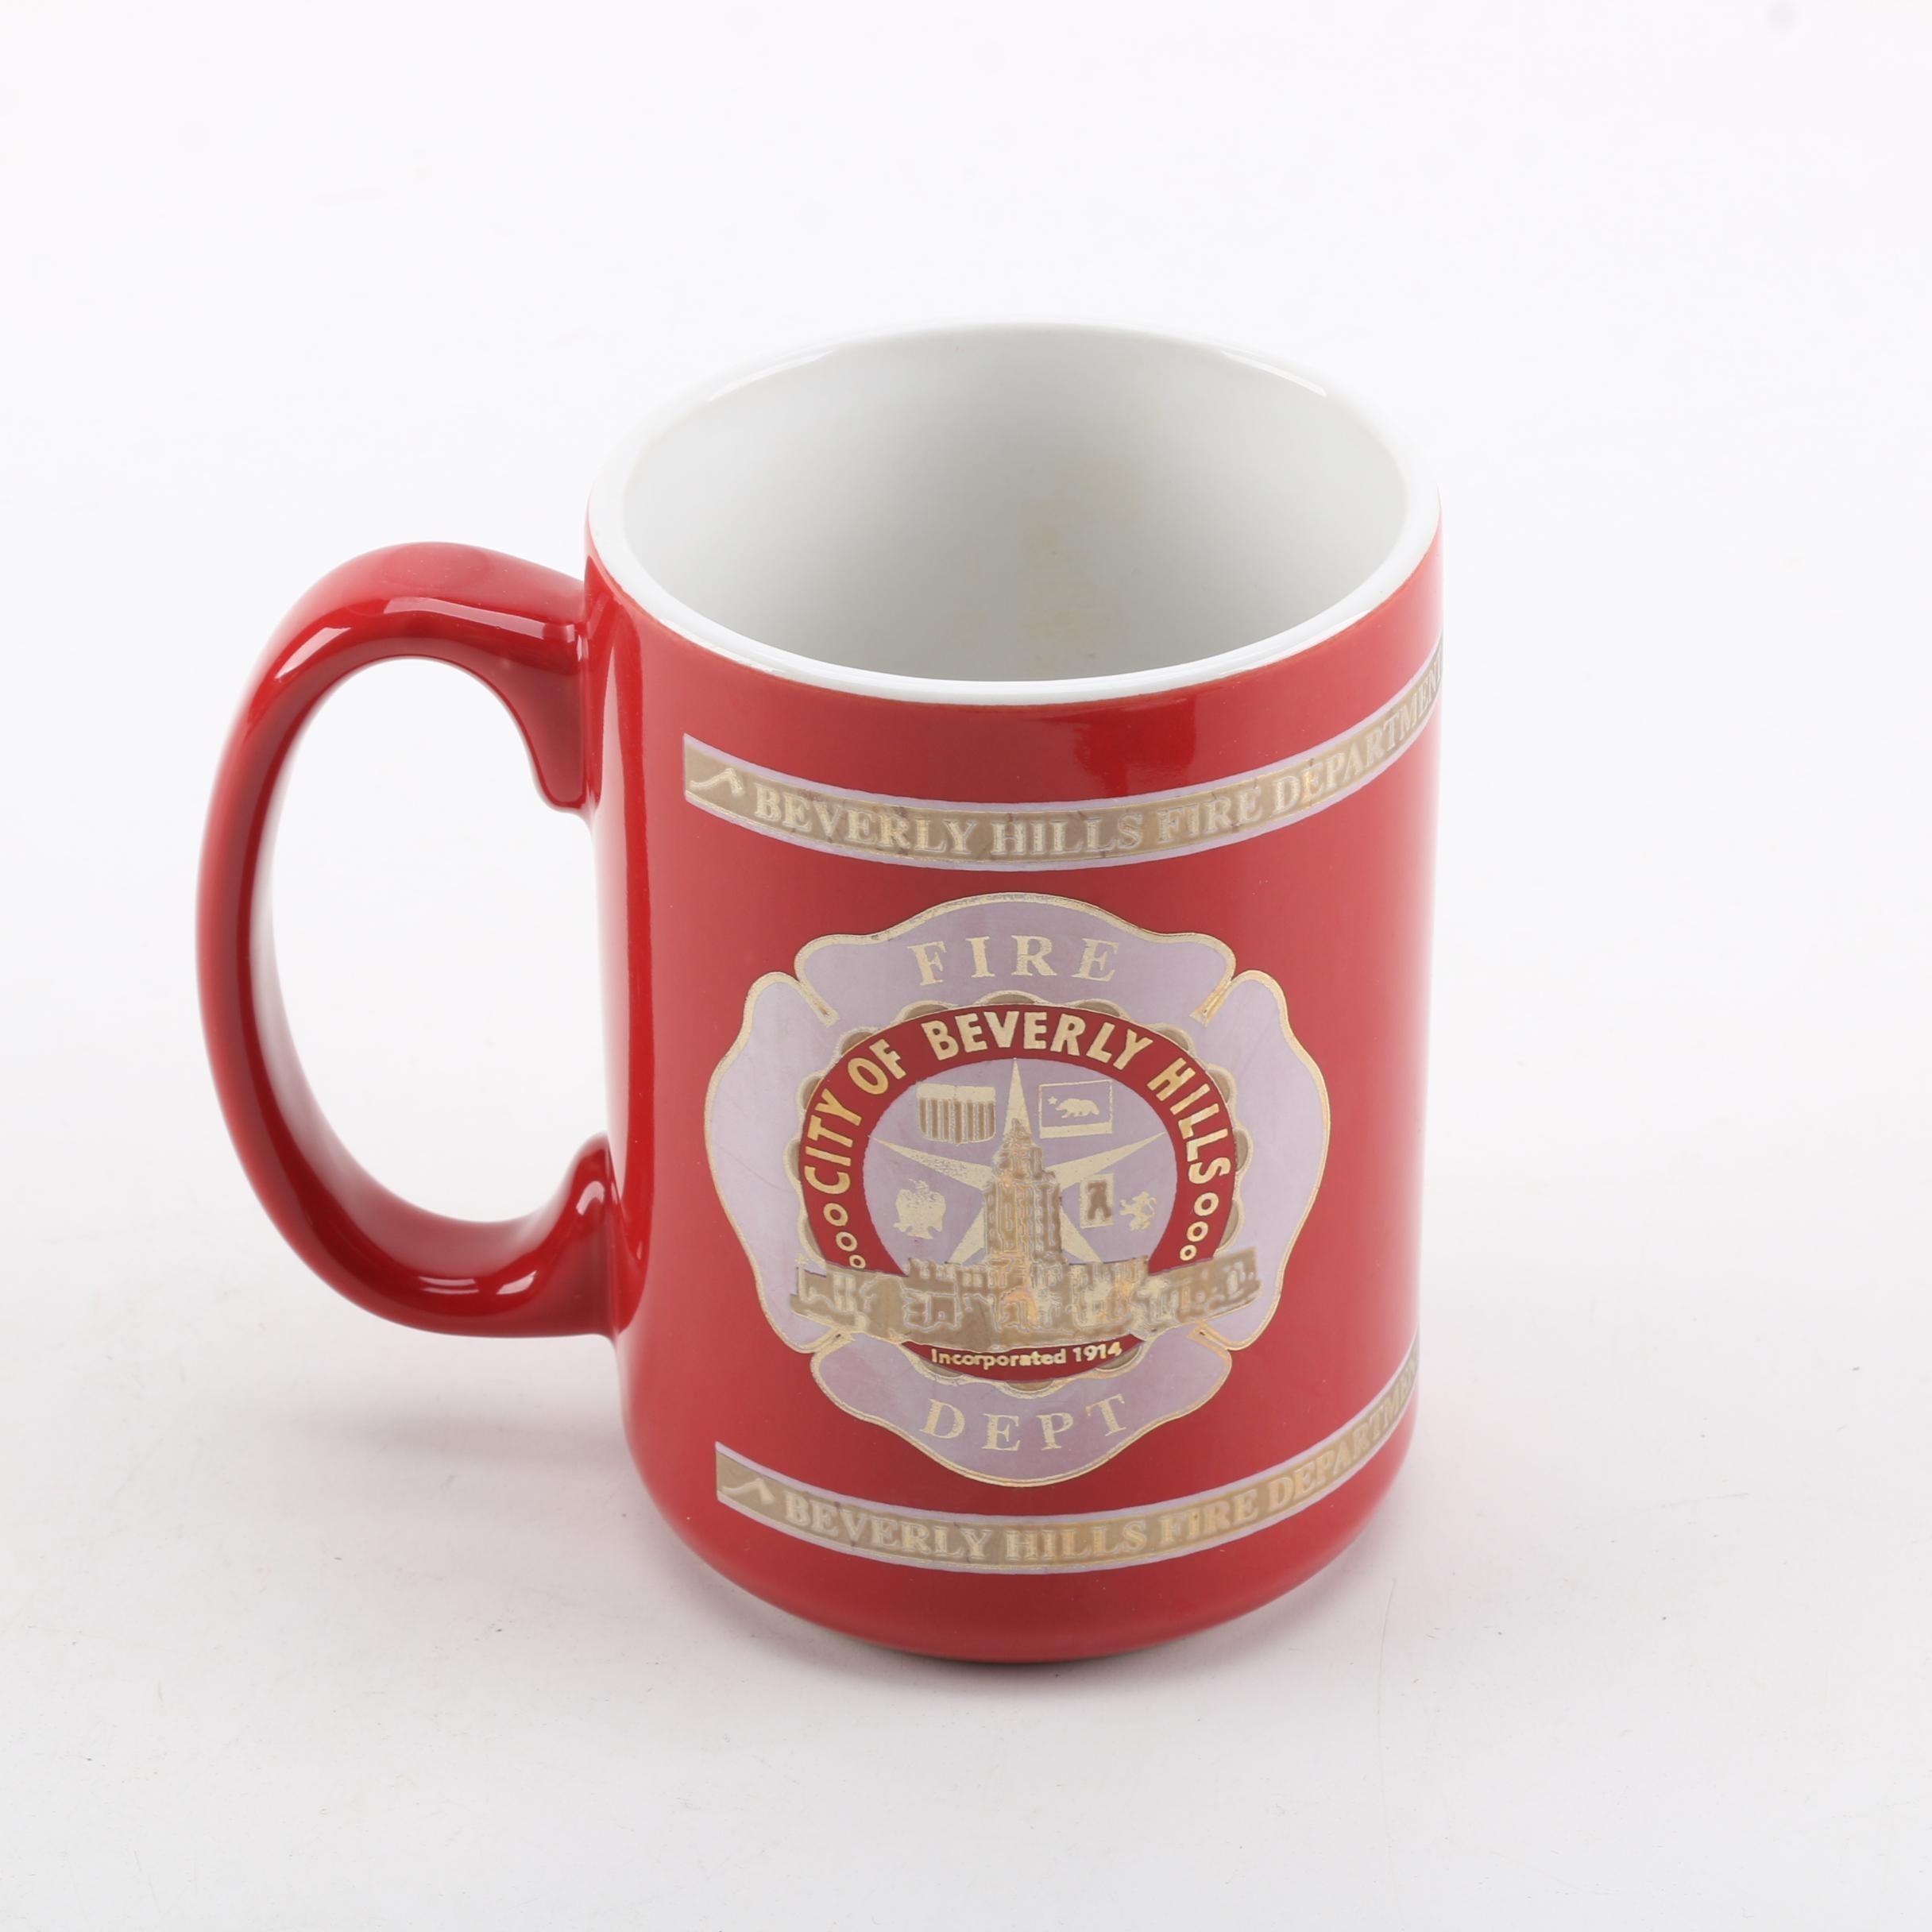 Beverley Hills Fire Department Red Ceramic Mug